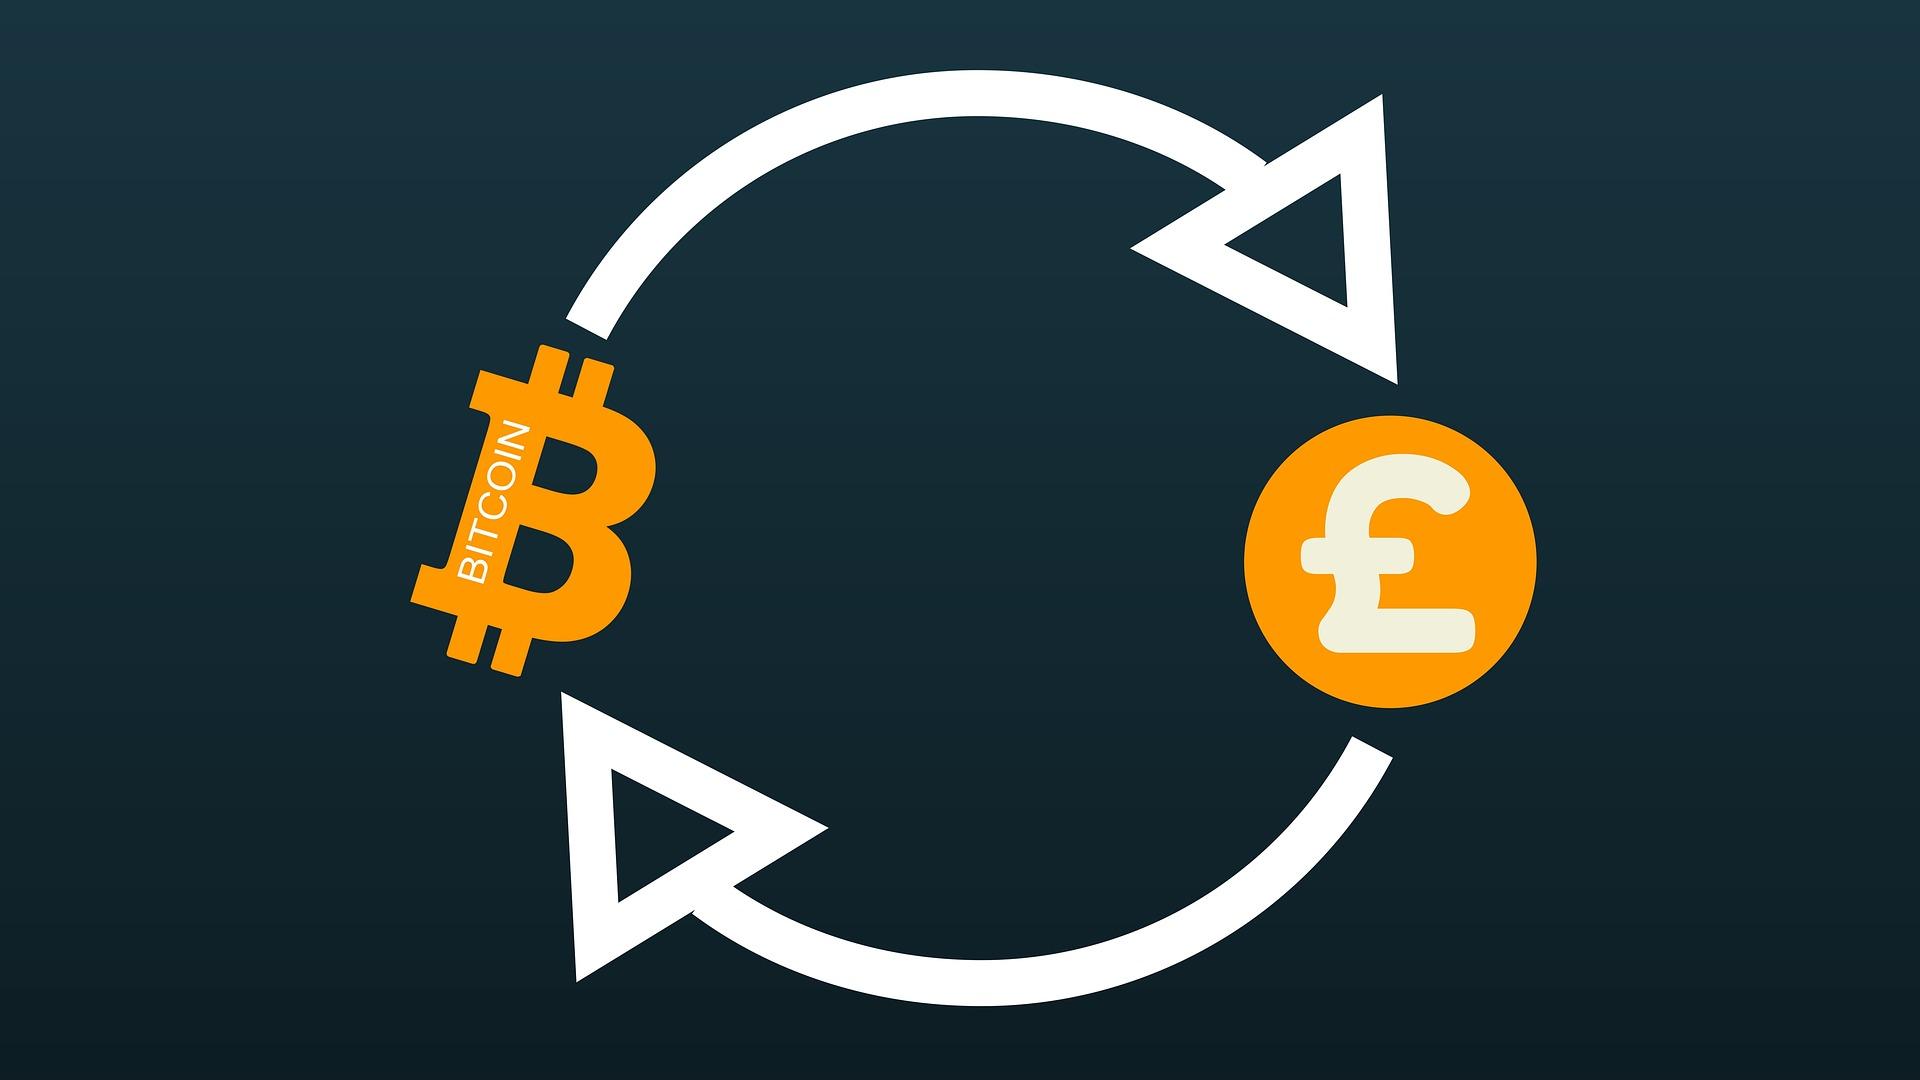 hoe krijg je bitcoins 2017